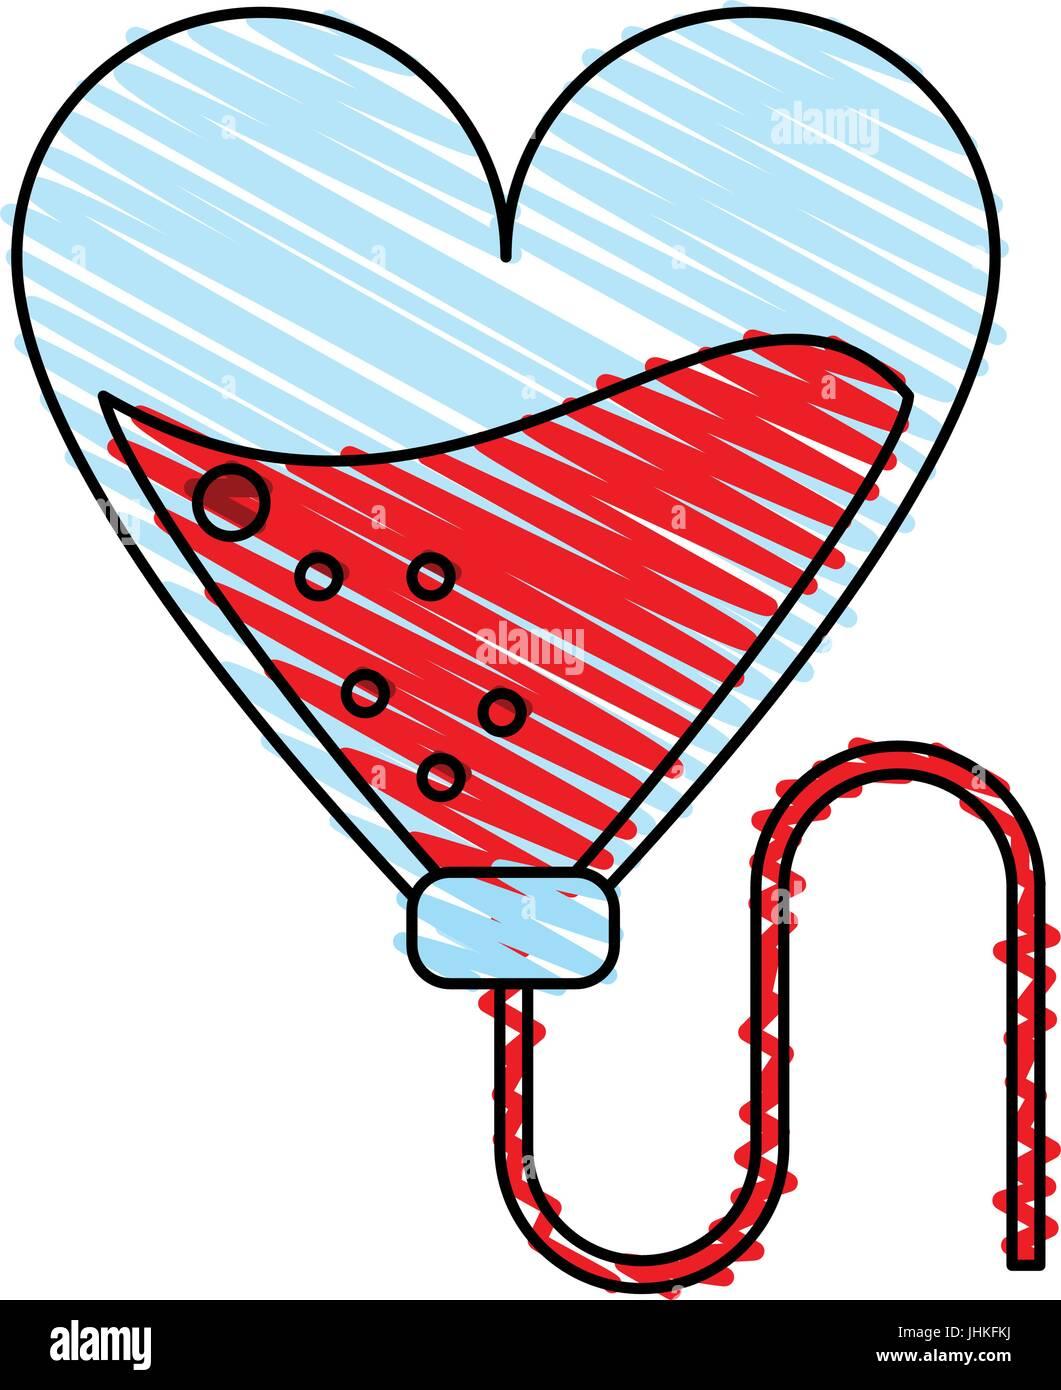 Blood unit vector illustration - Stock Vector